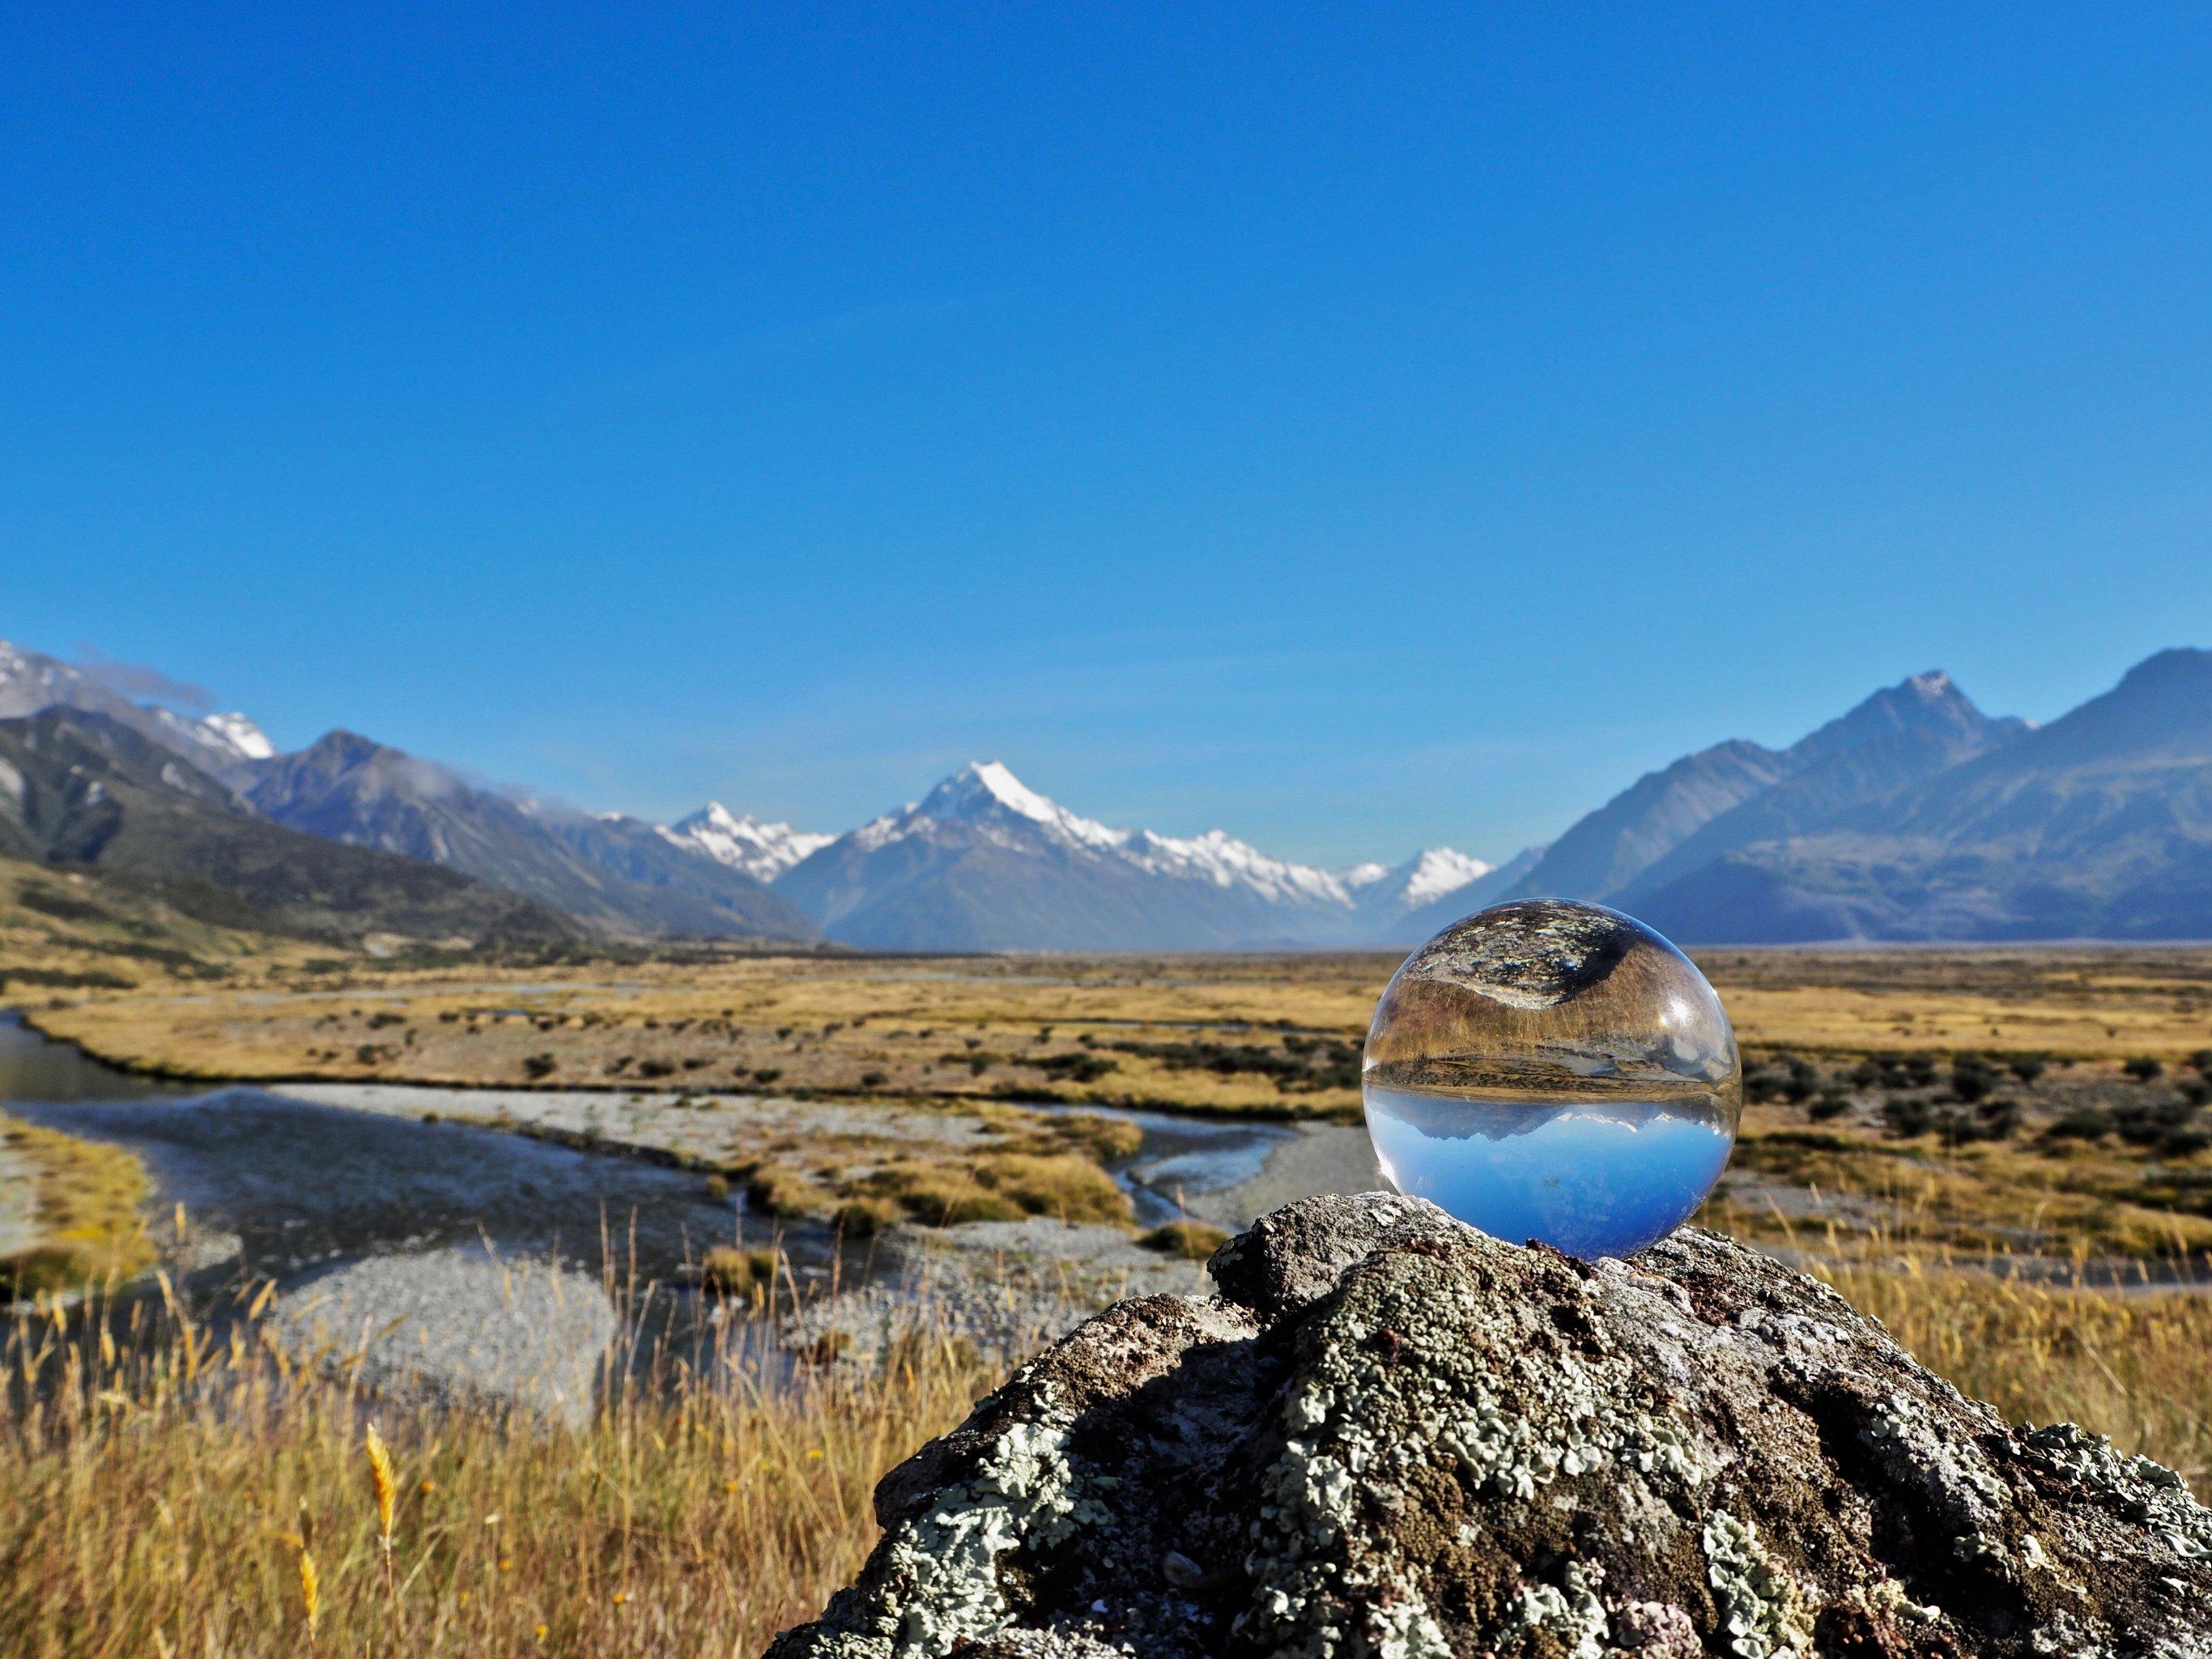 21-Day Classic New Zealand - New Zealand Itinerary